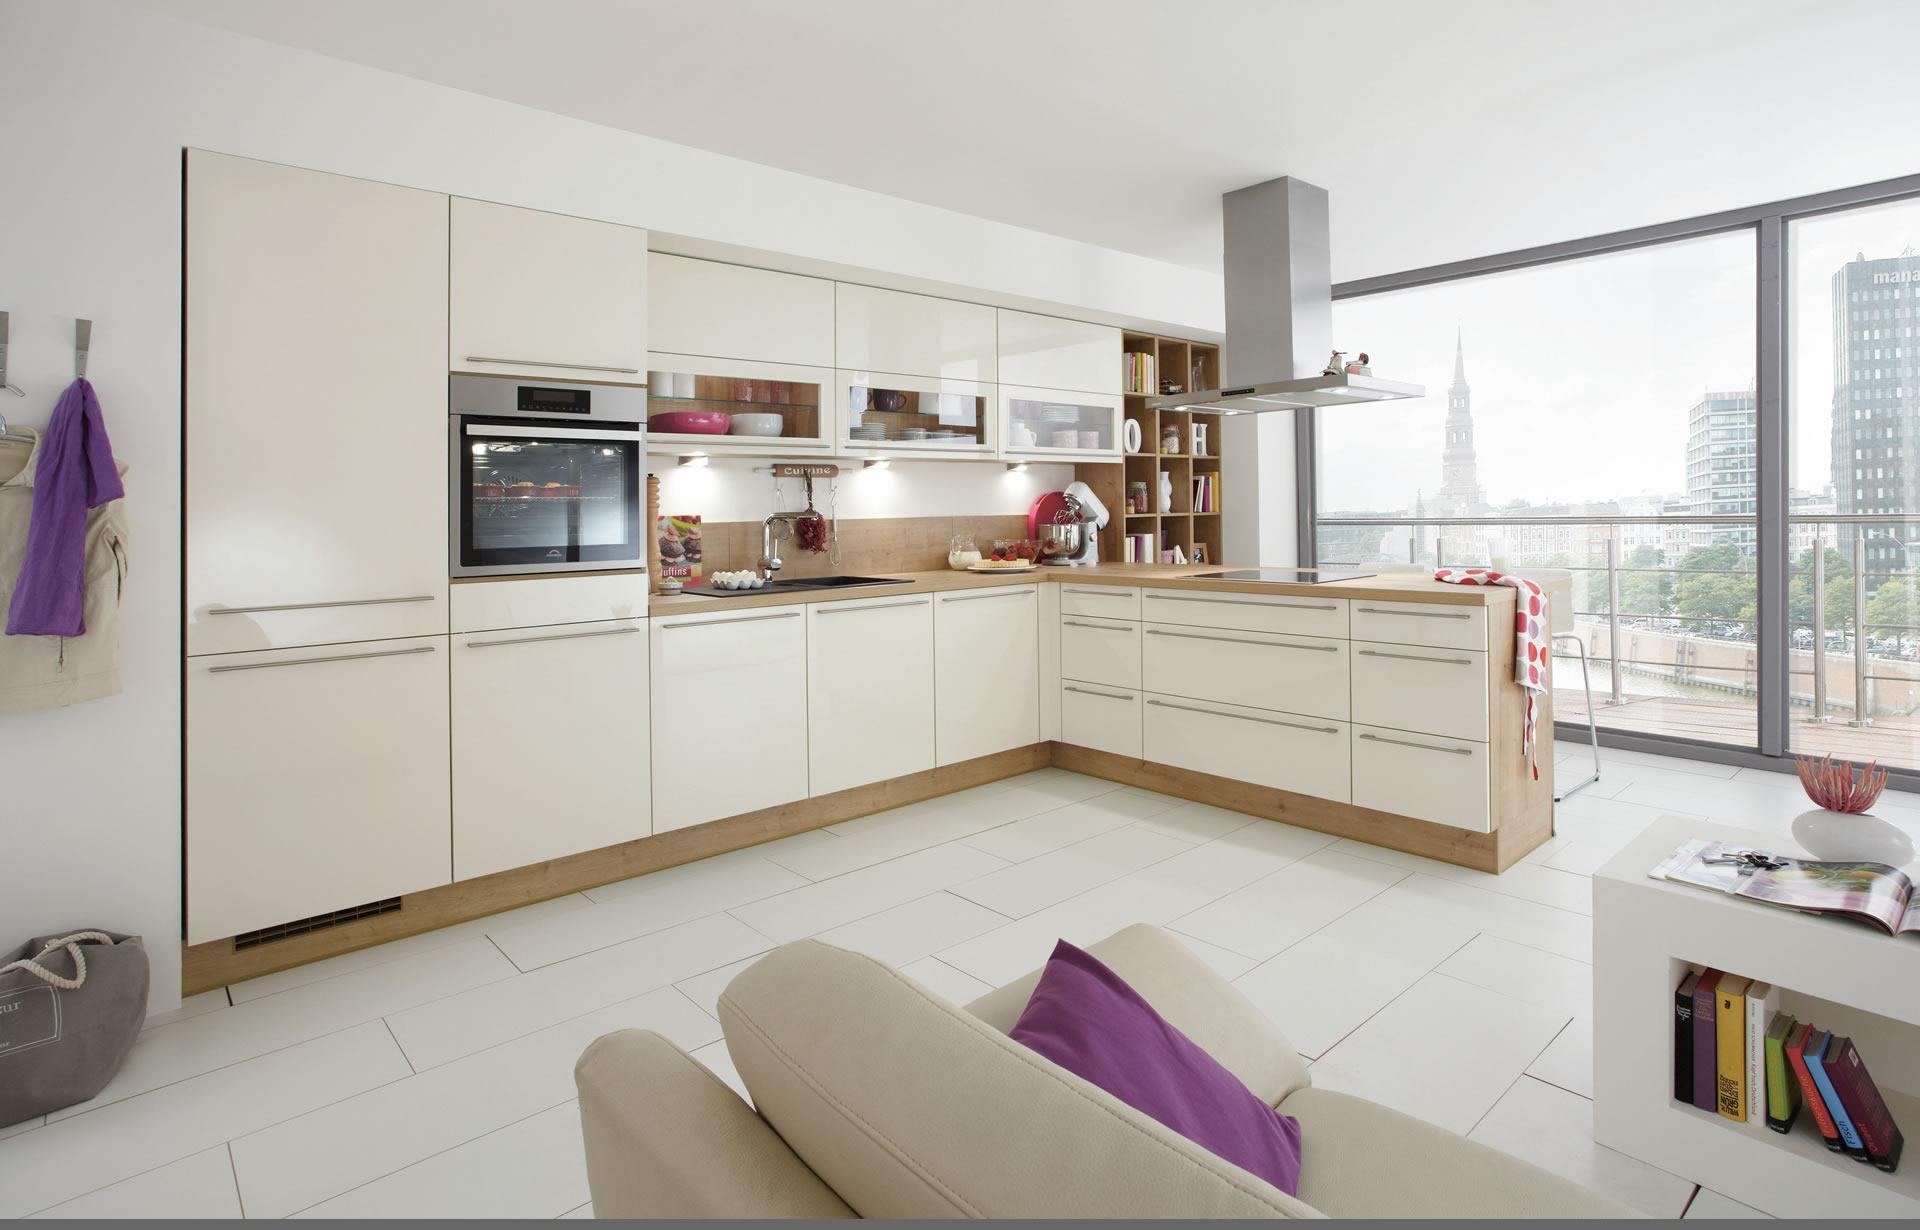 Beautiful Küchen Nobilia Preise Ideas - Milbank.us - milbank.us